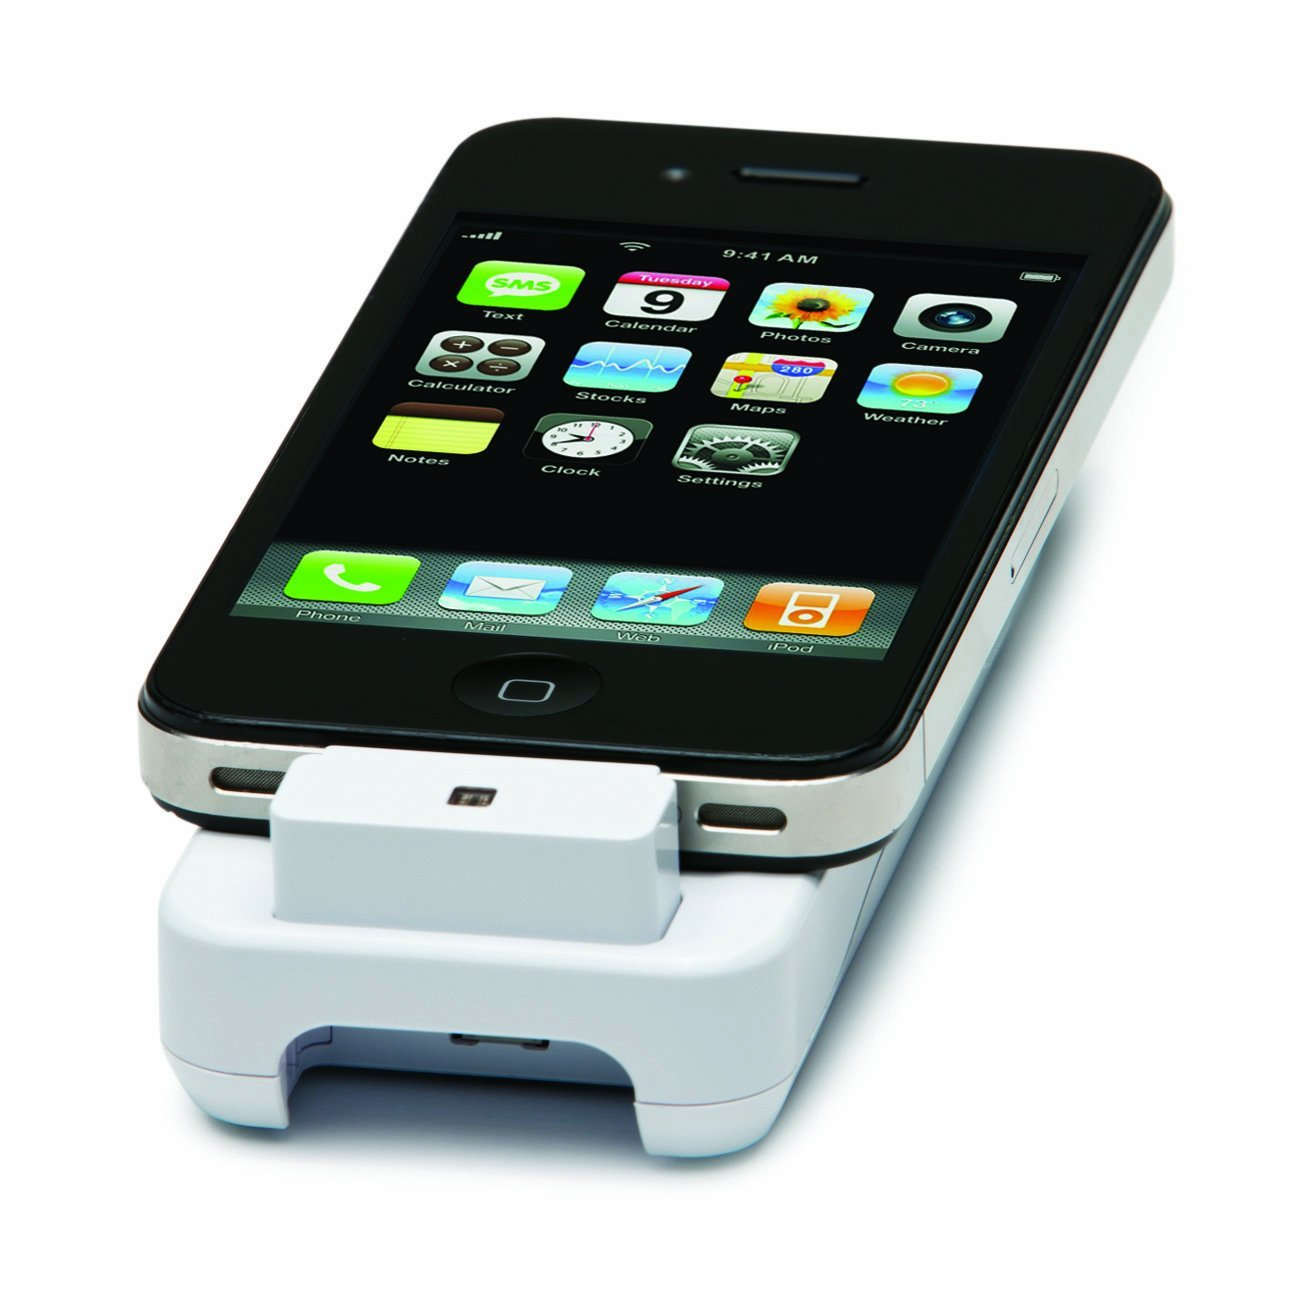 Gifts for the gadget guru